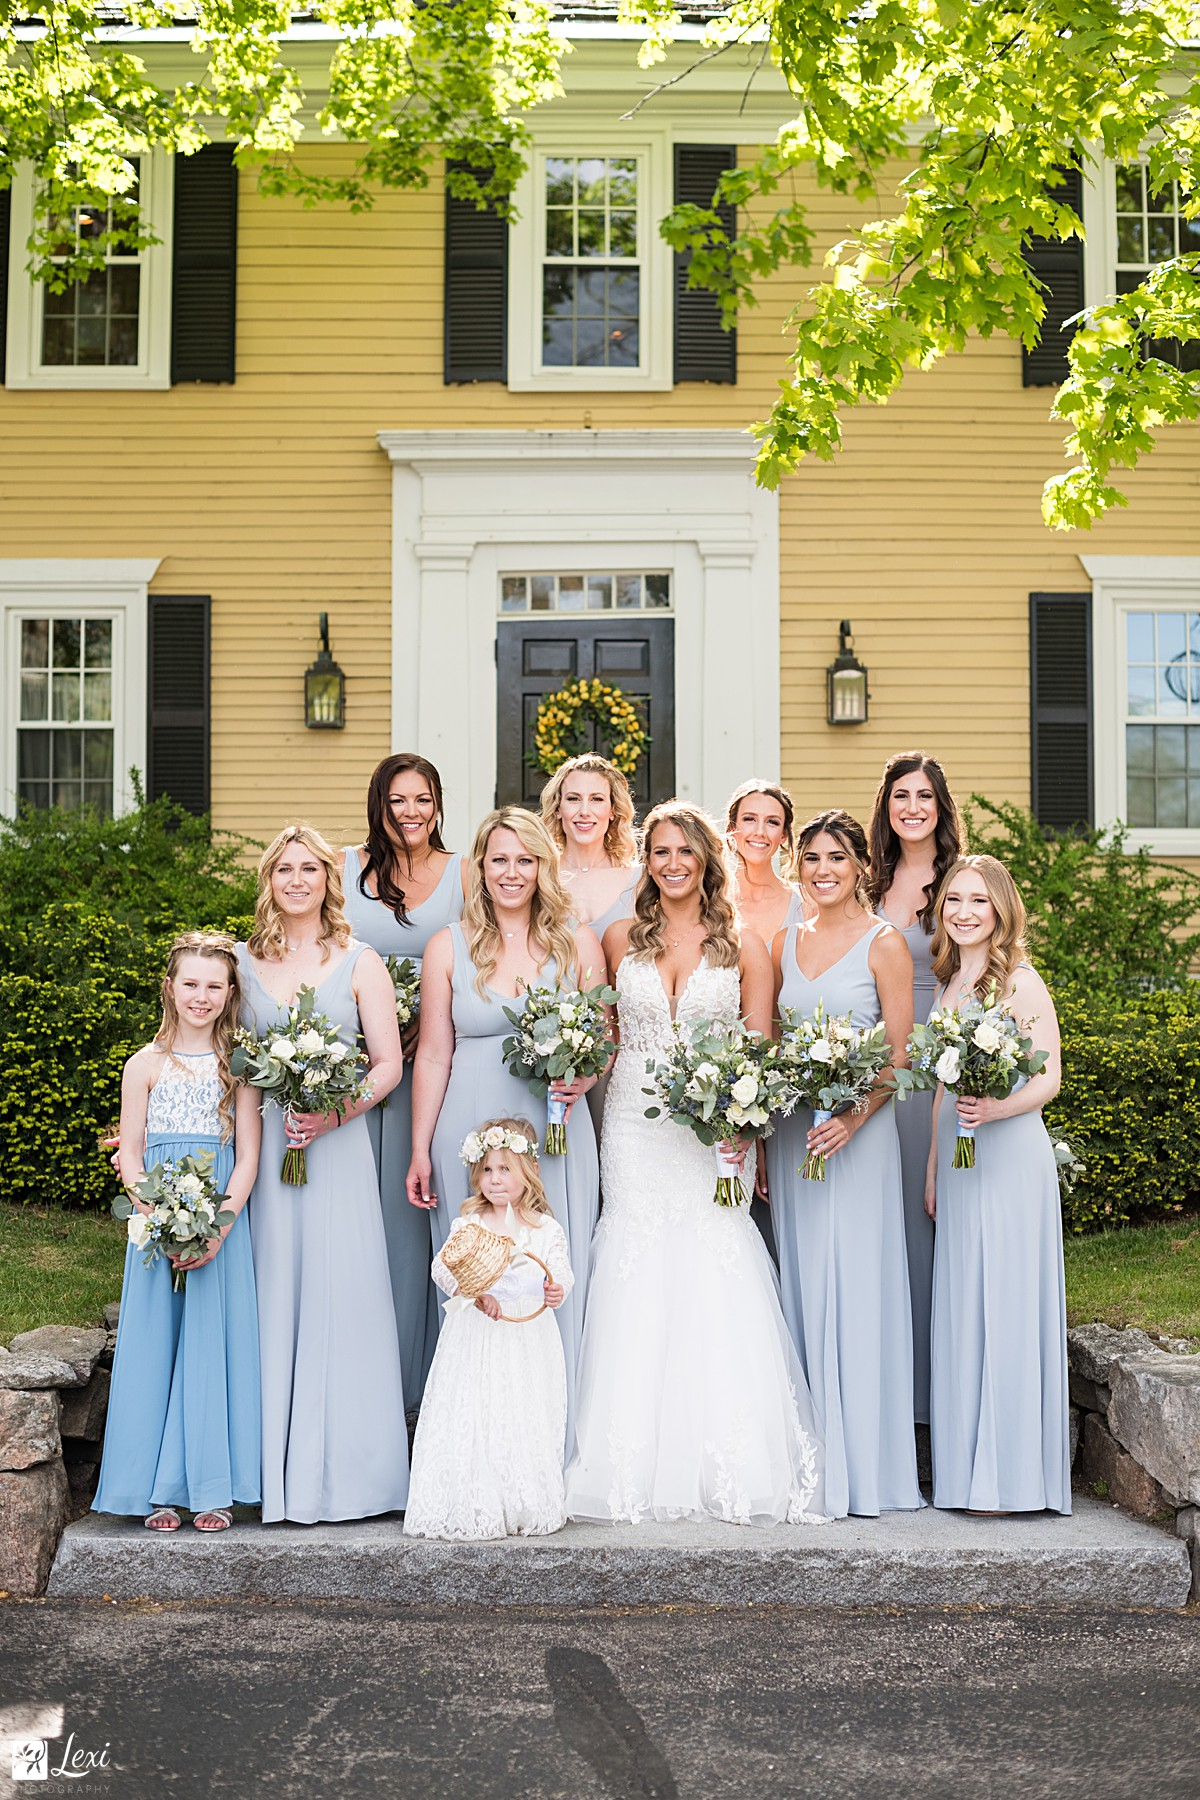 bedford-village-inn-wedding-bridesmaids-blue-dresses.jpg